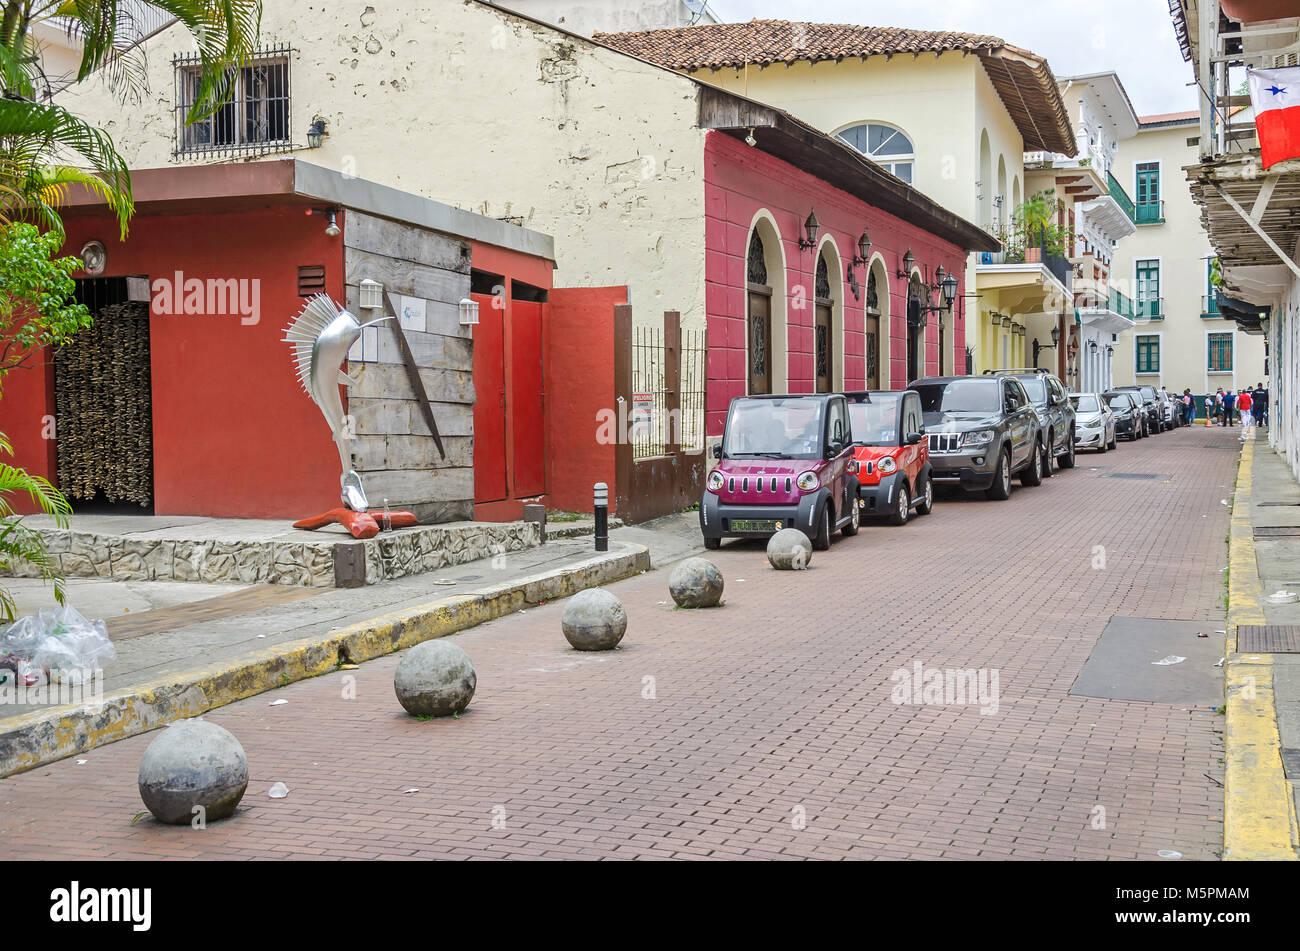 Panama City, Panama - November 3, 2017: A street in the historic district Casco Viejo (Spanish for Old Quarter), - Stock Image